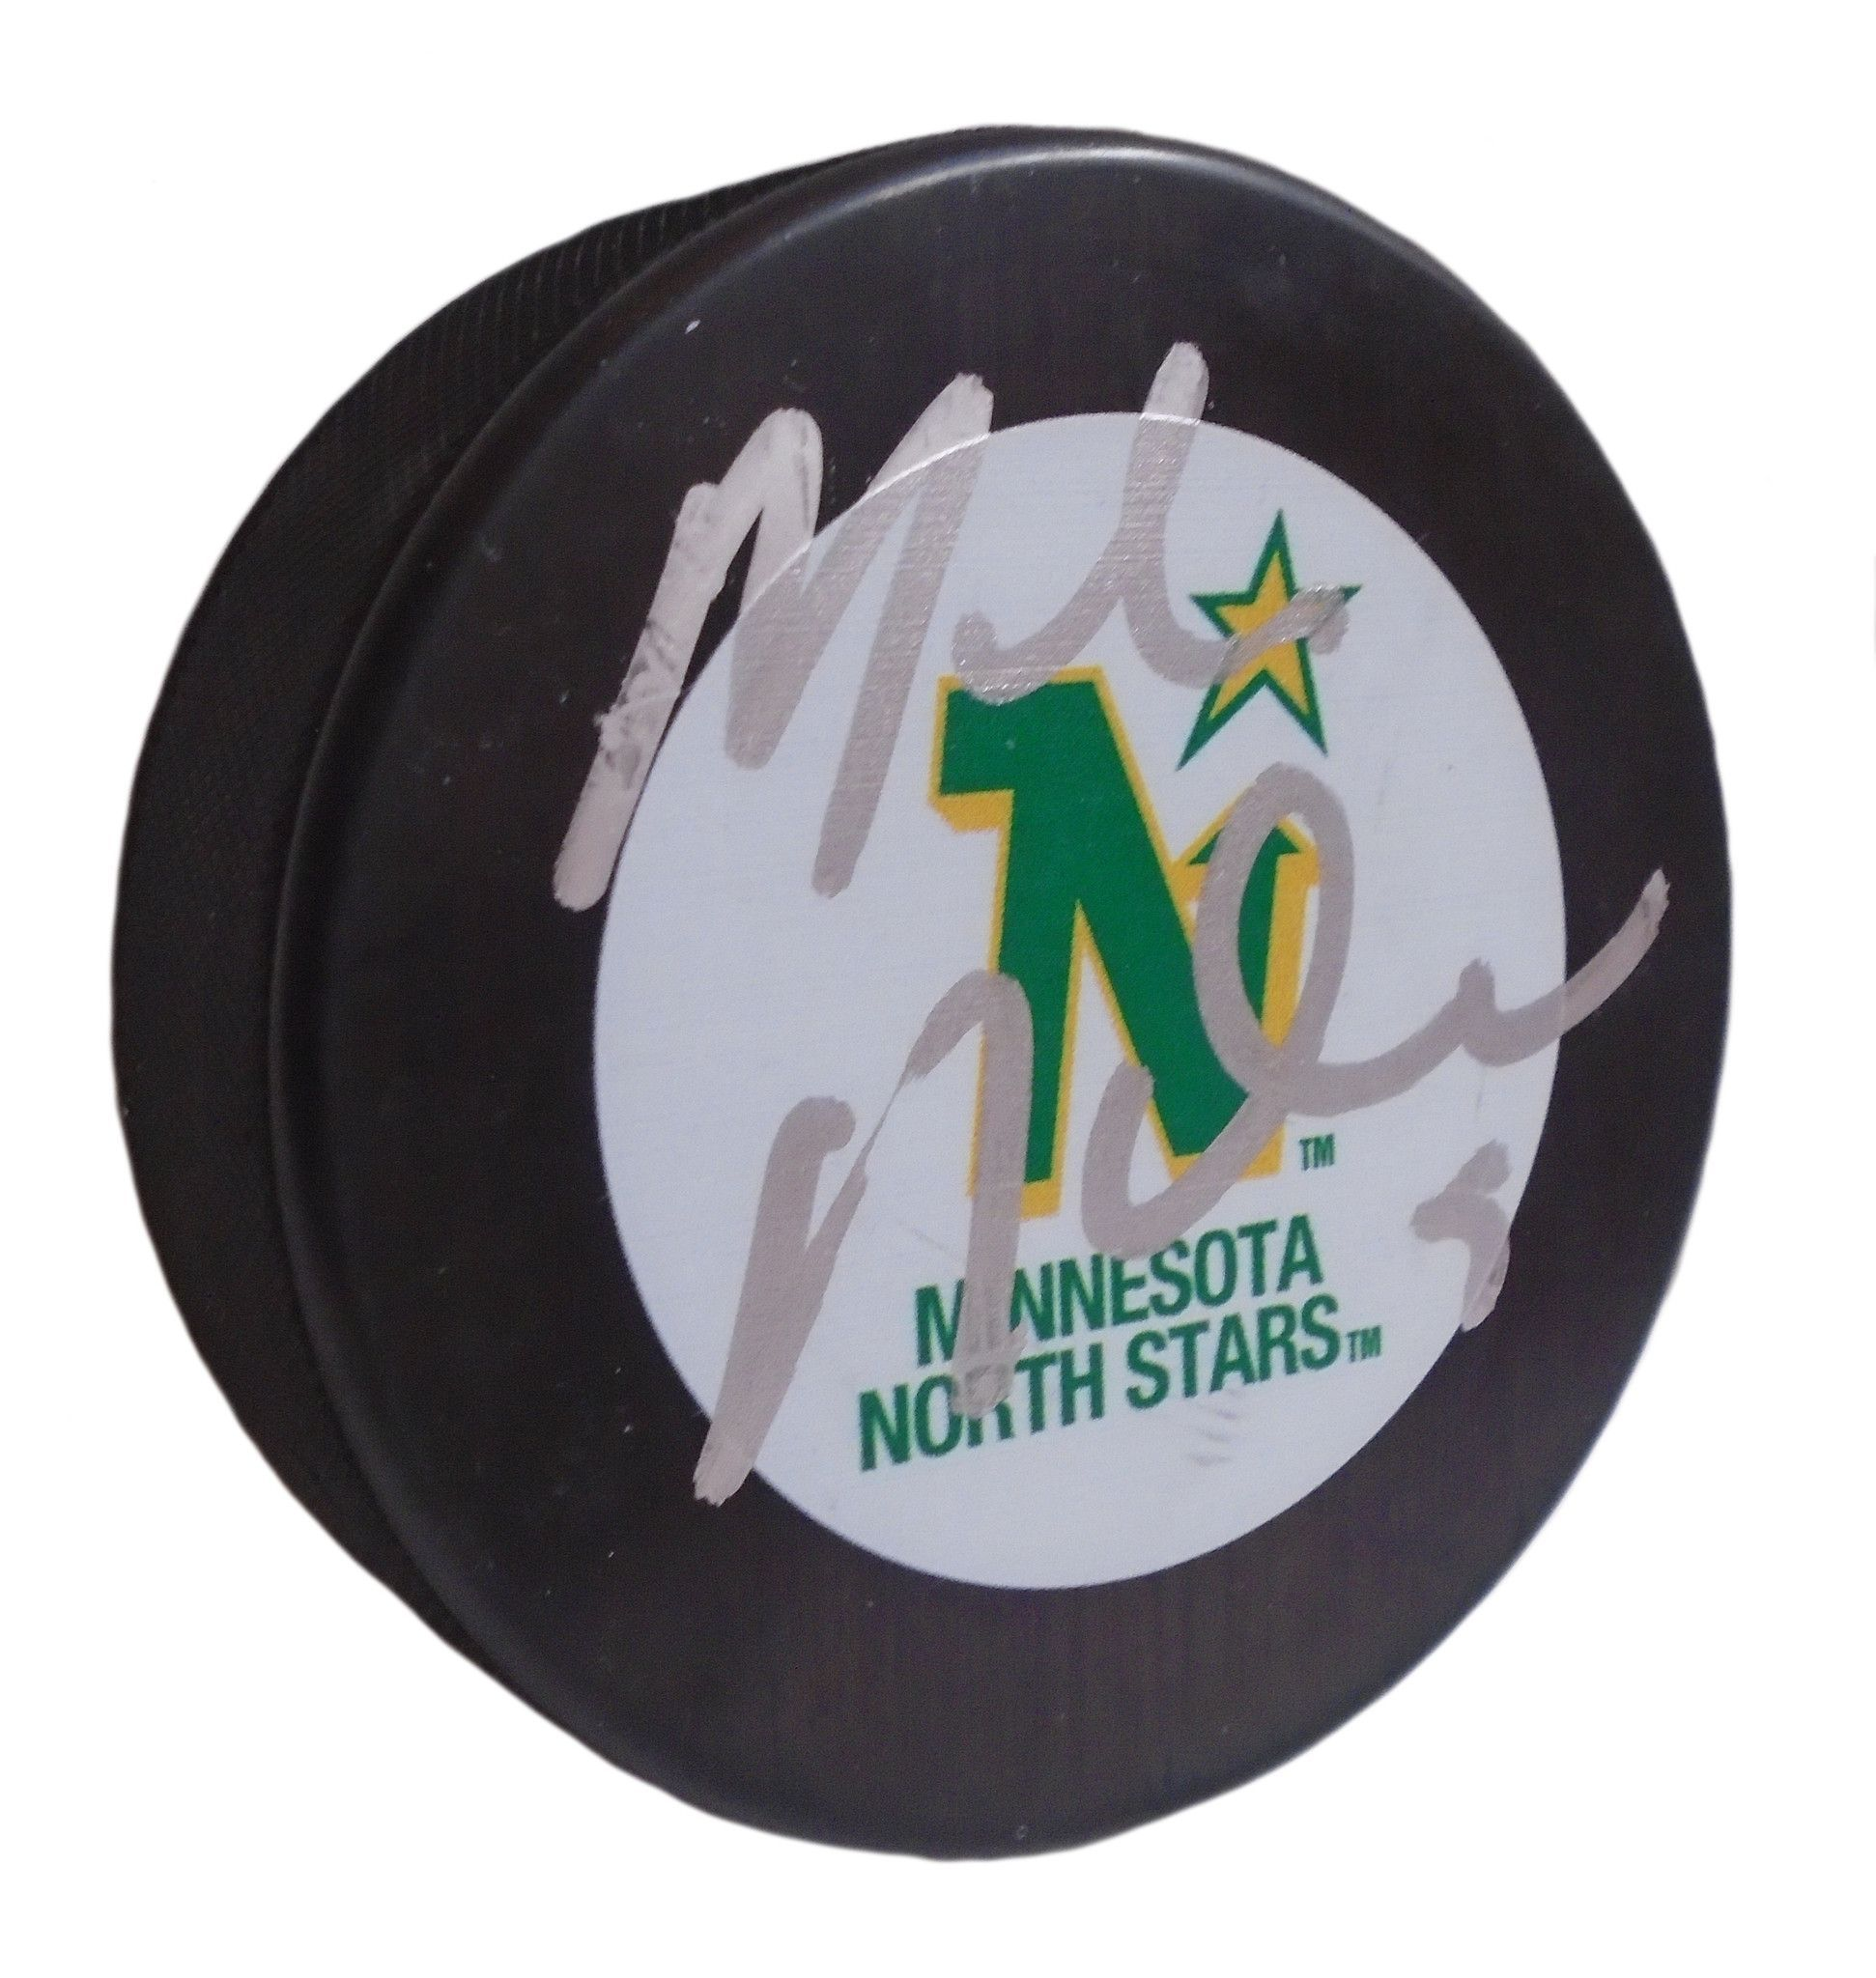 0a743fab242 Mike Modano Autographed Minnesota North Stars Logo Hockey Puck ...